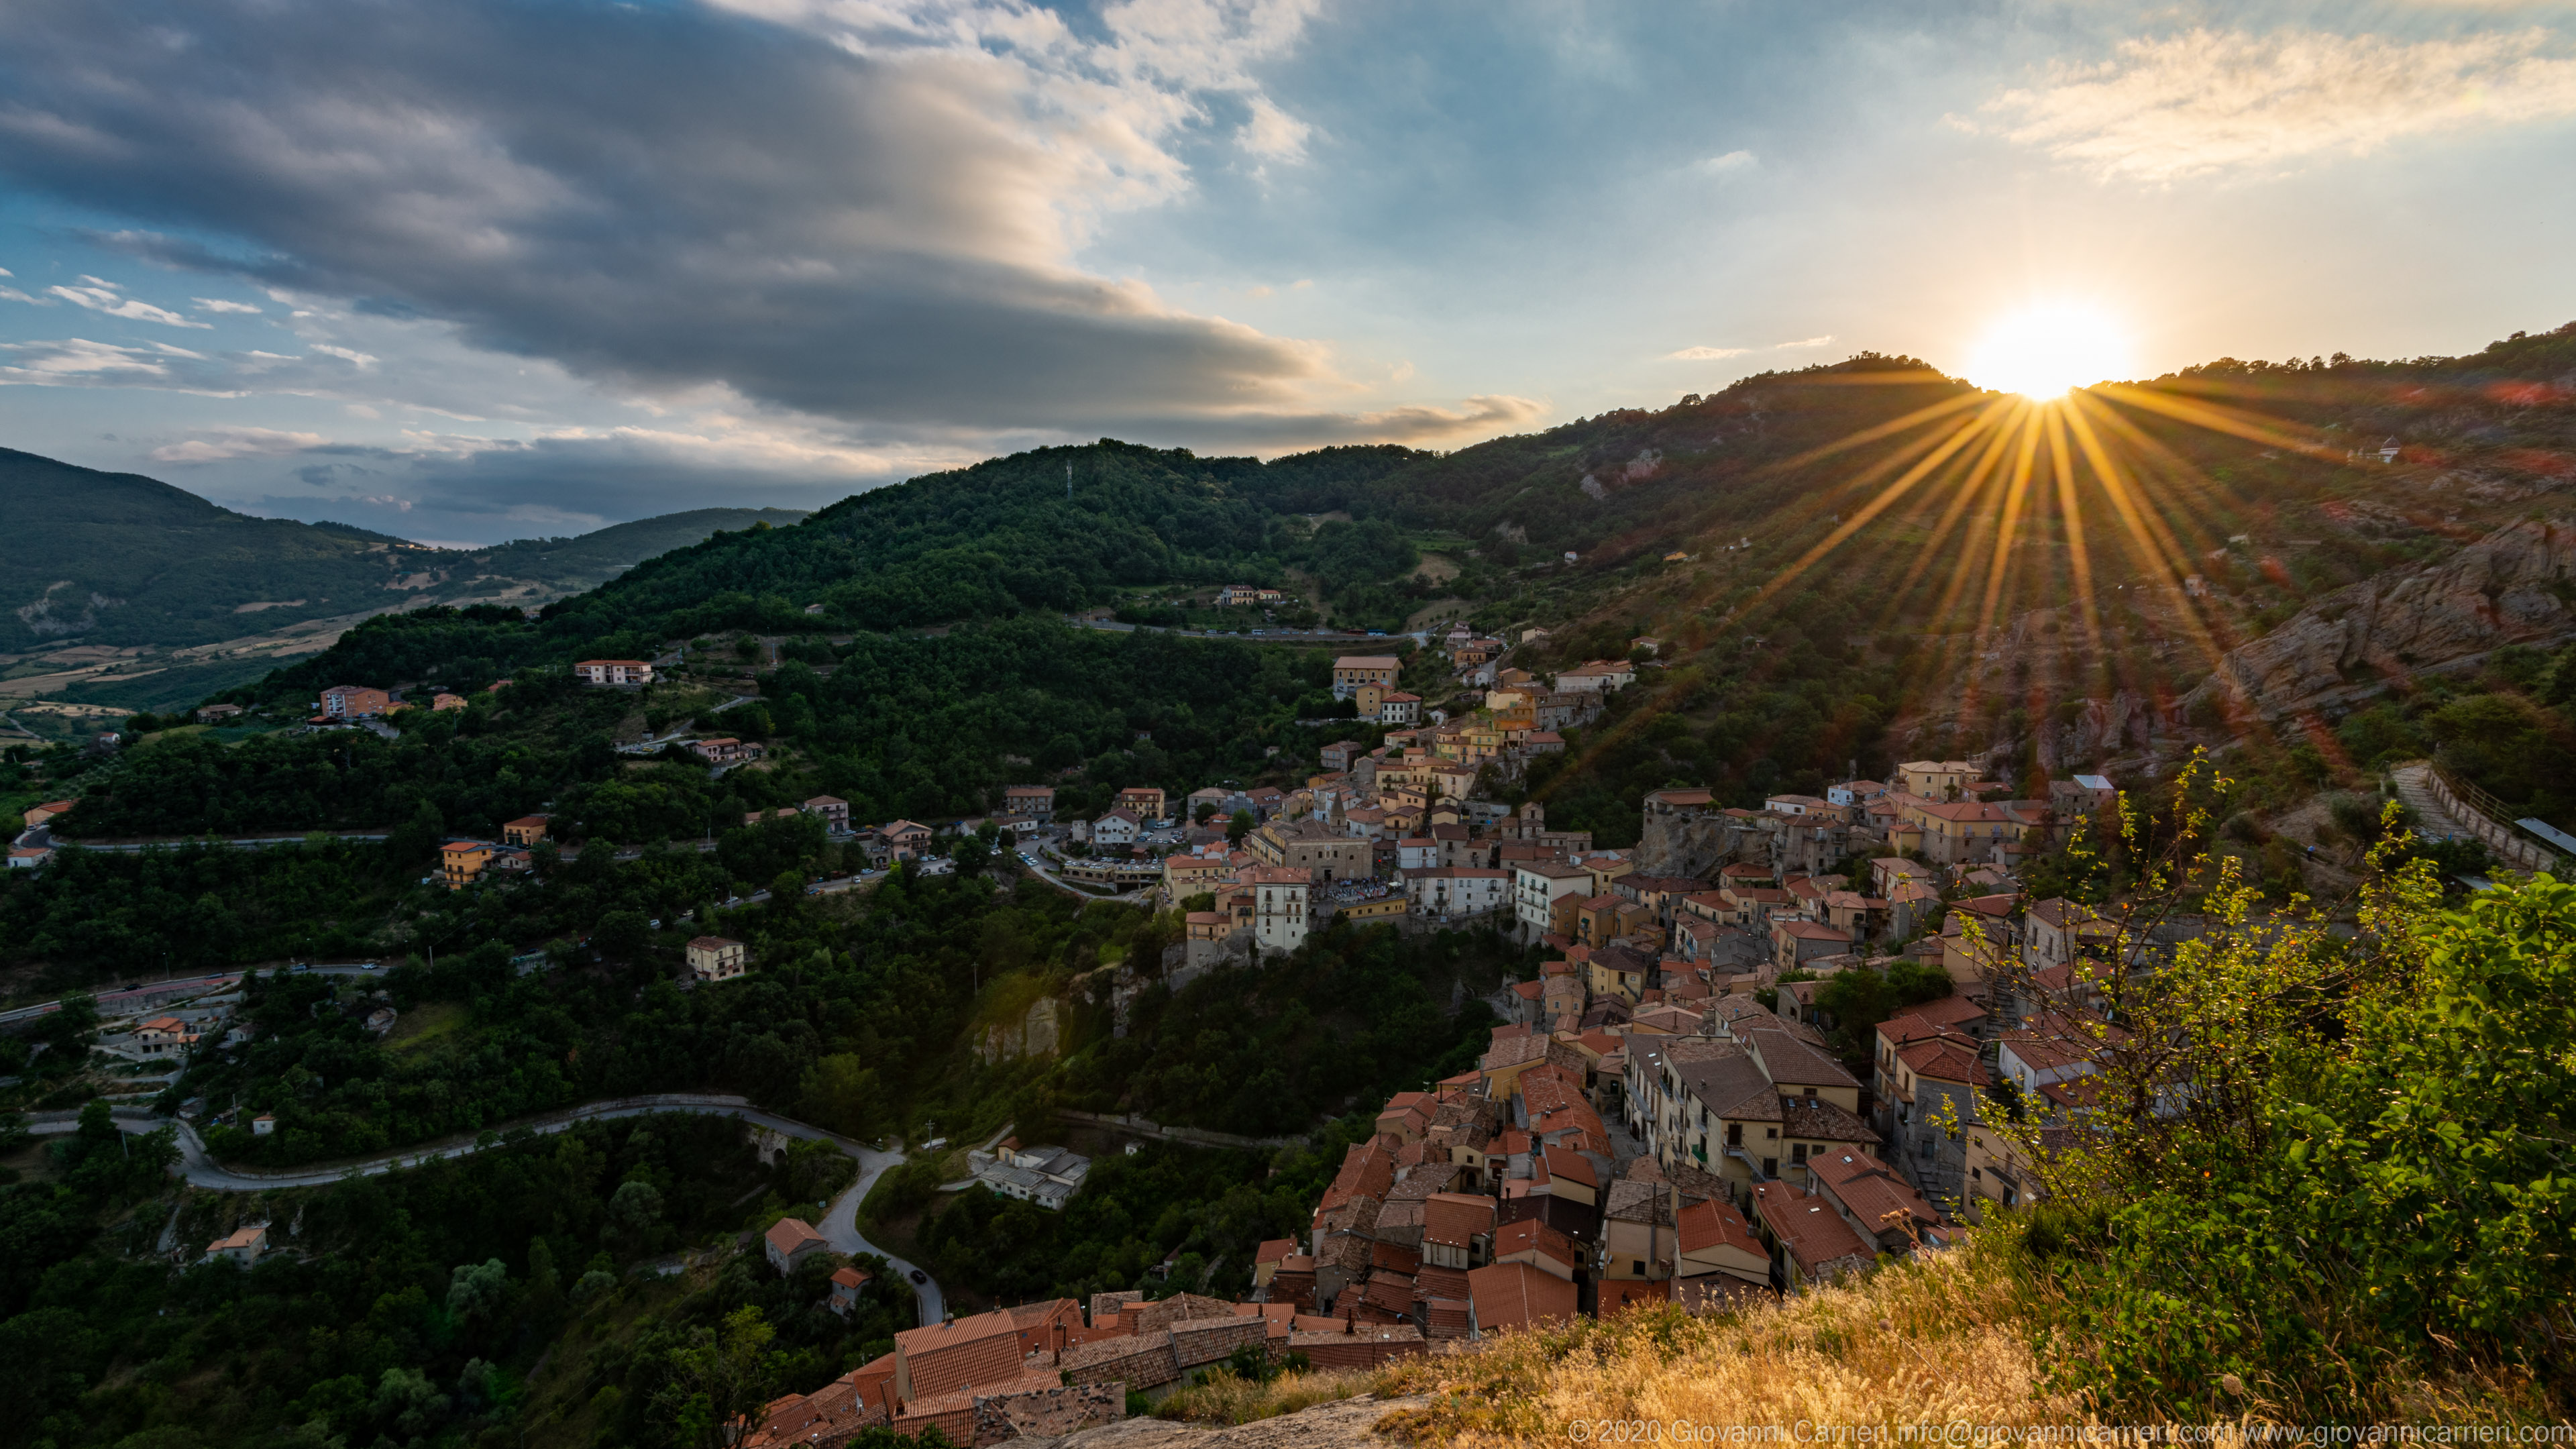 Castelmezzano al tramonto